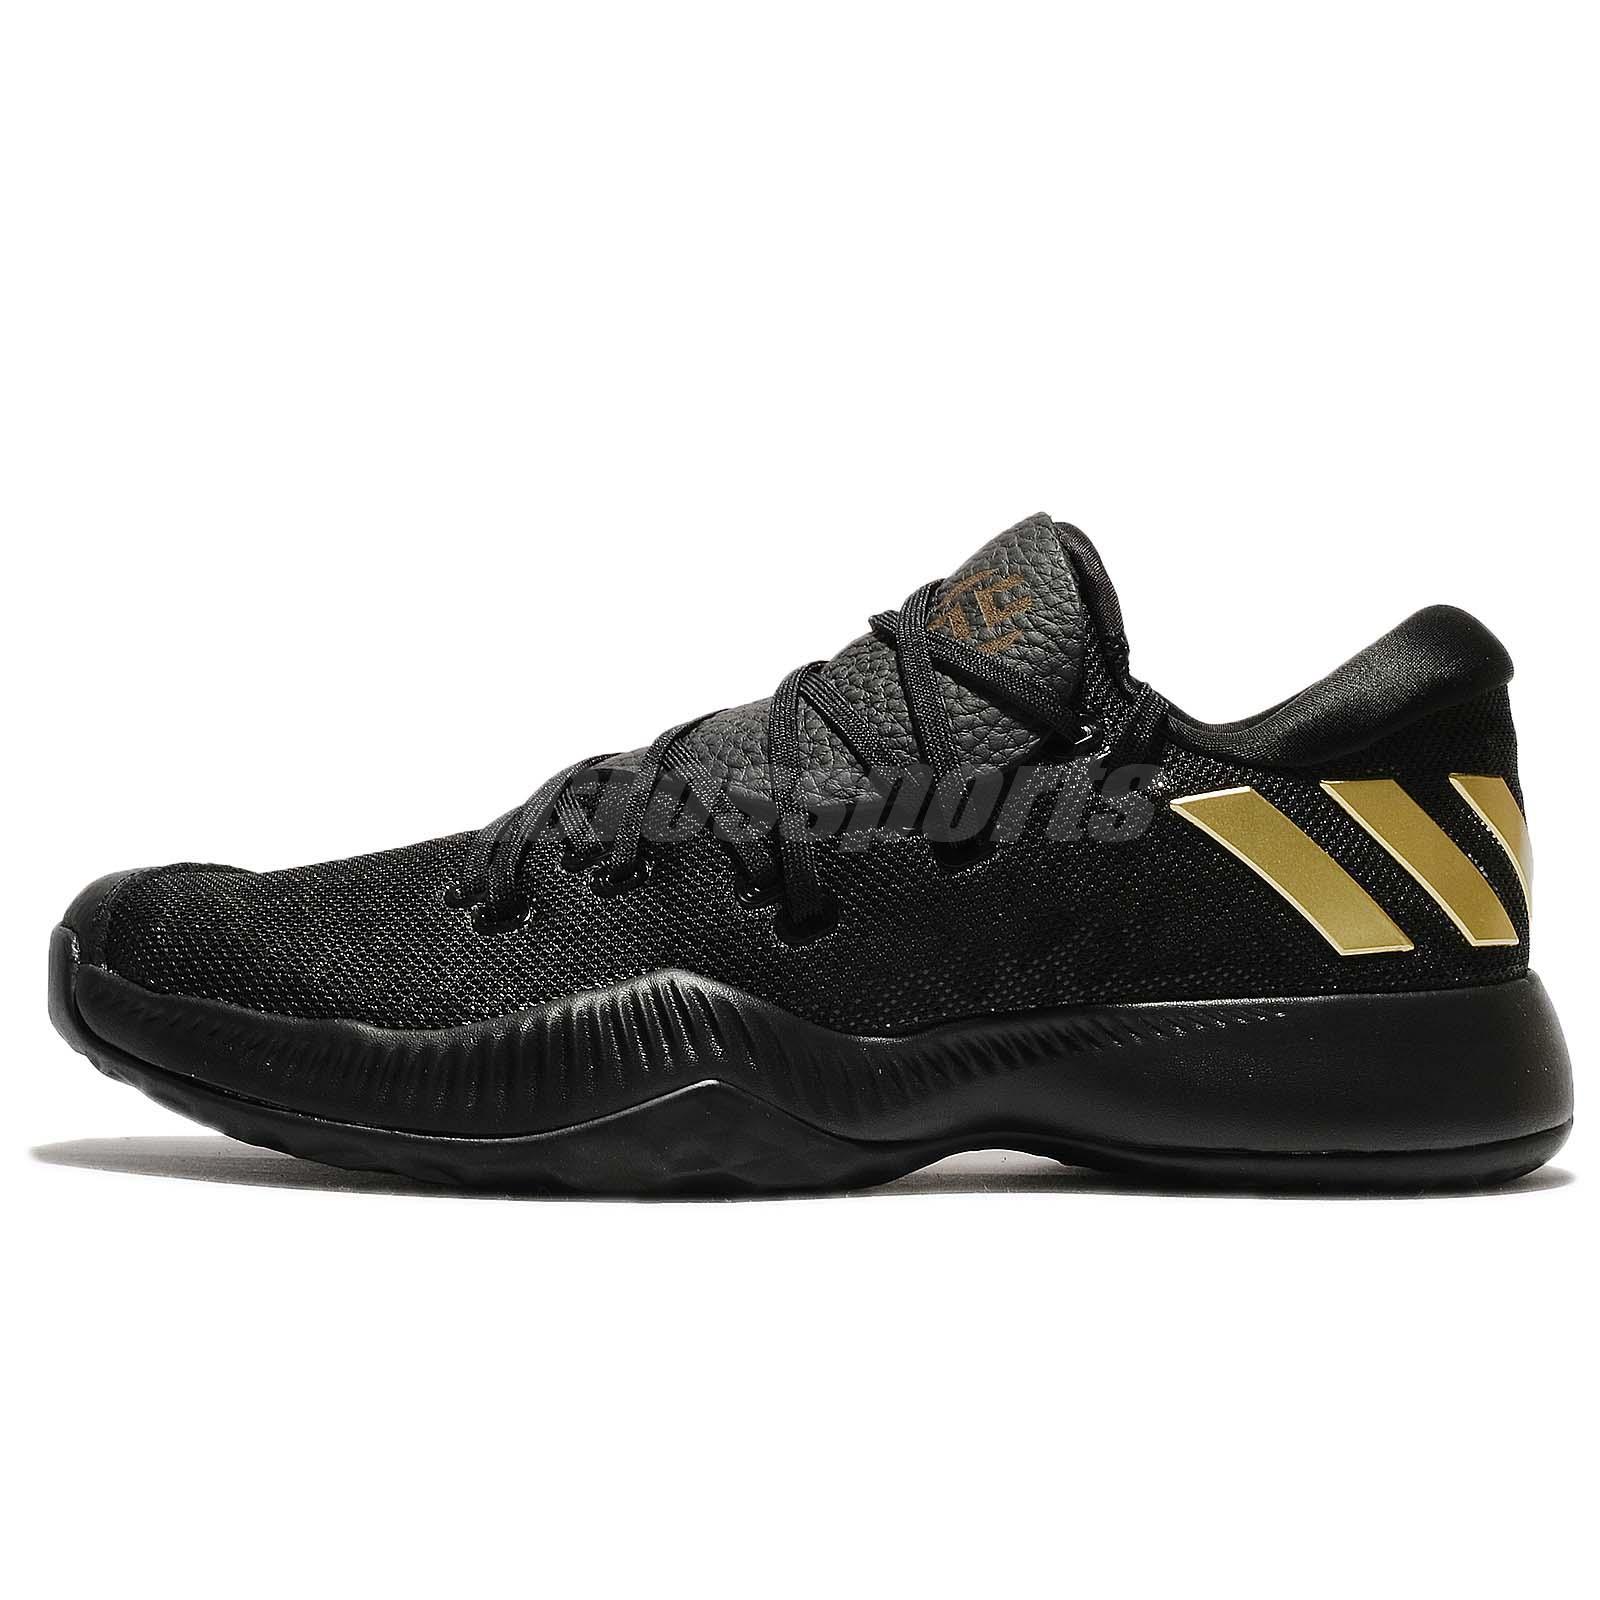 903465330 adidas Harden B E James Bounce Black Gold Men Basketball Shoes Sneakers  AC7819